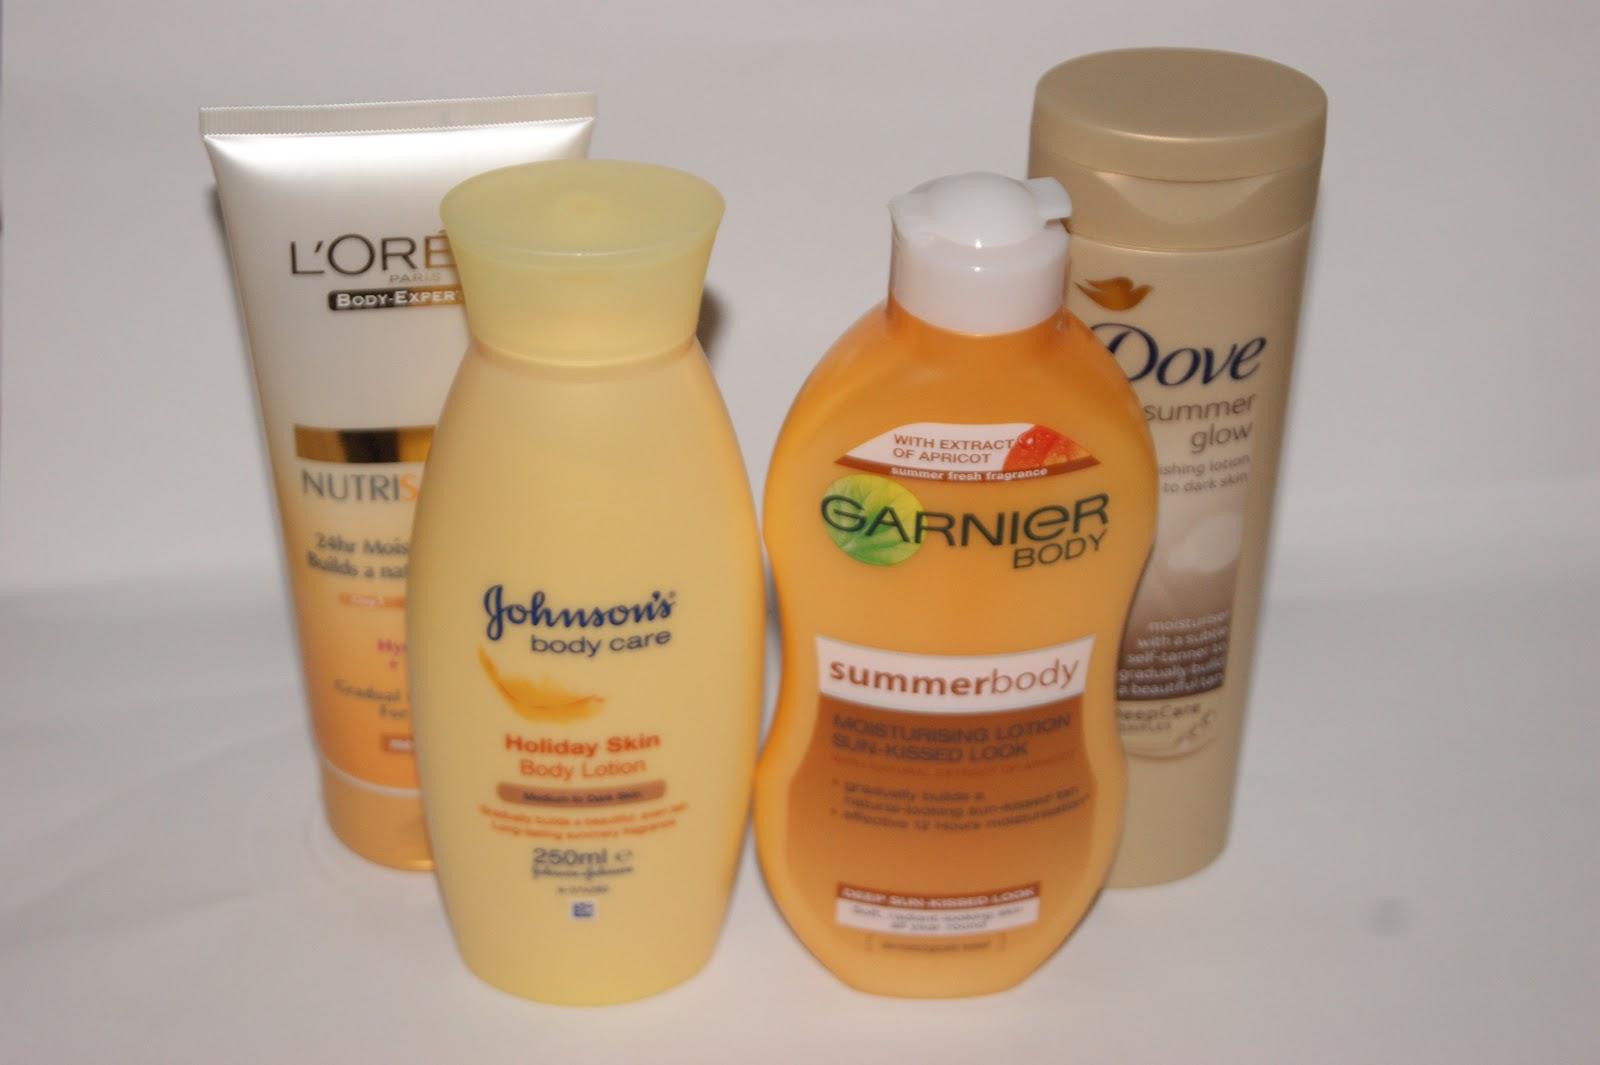 Khadi Natural Sunscreen With Moisturiser Review